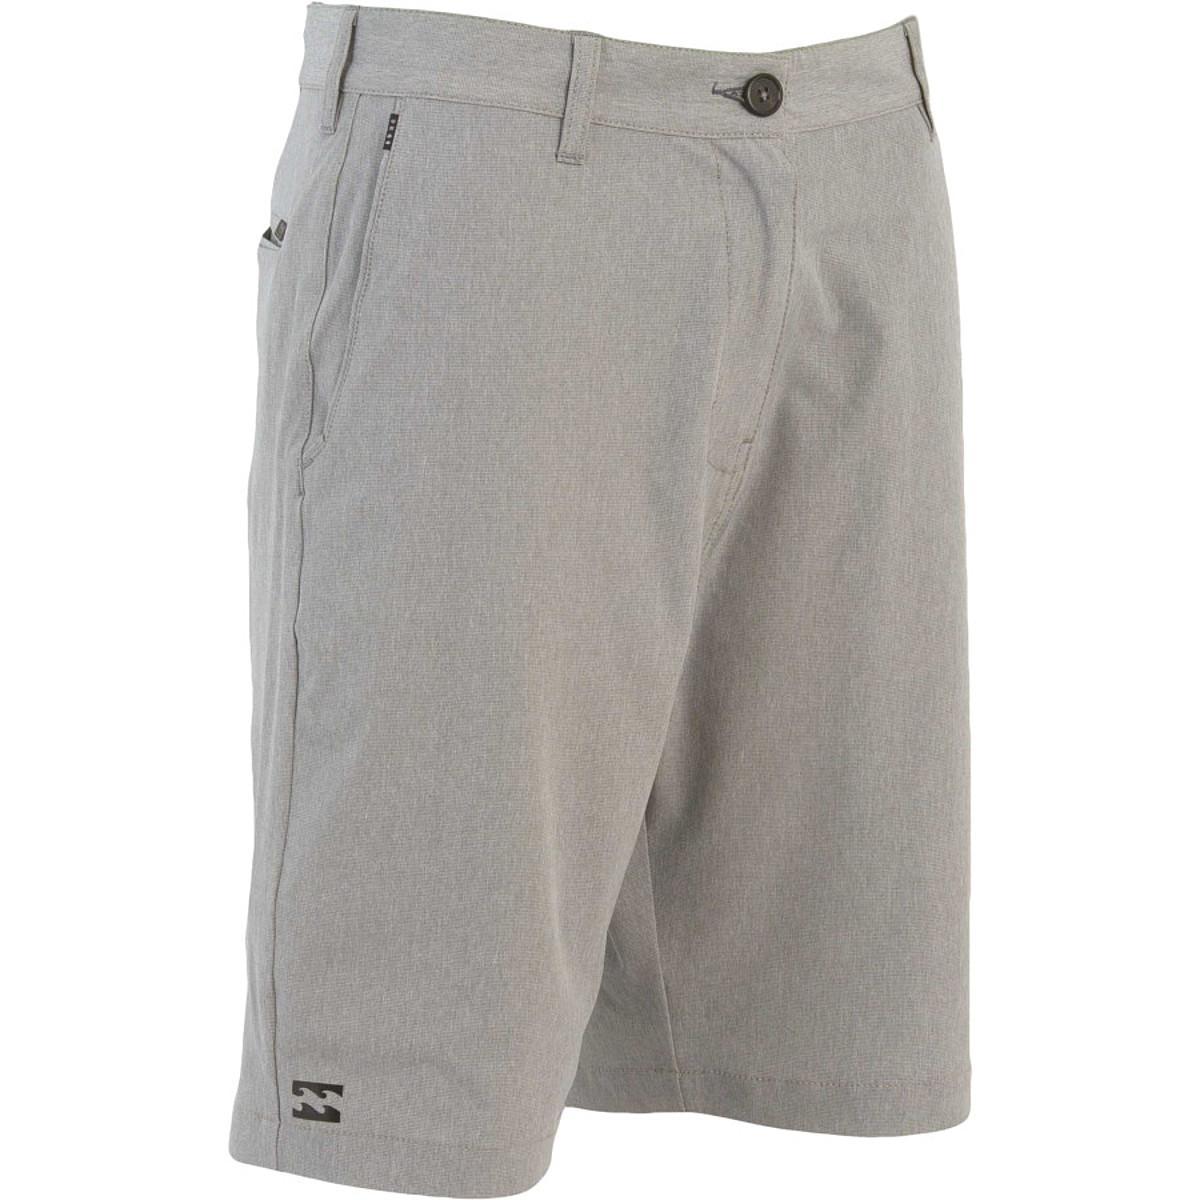 Billabong Crossfire X Hybrid Short - Men's Grey, 36